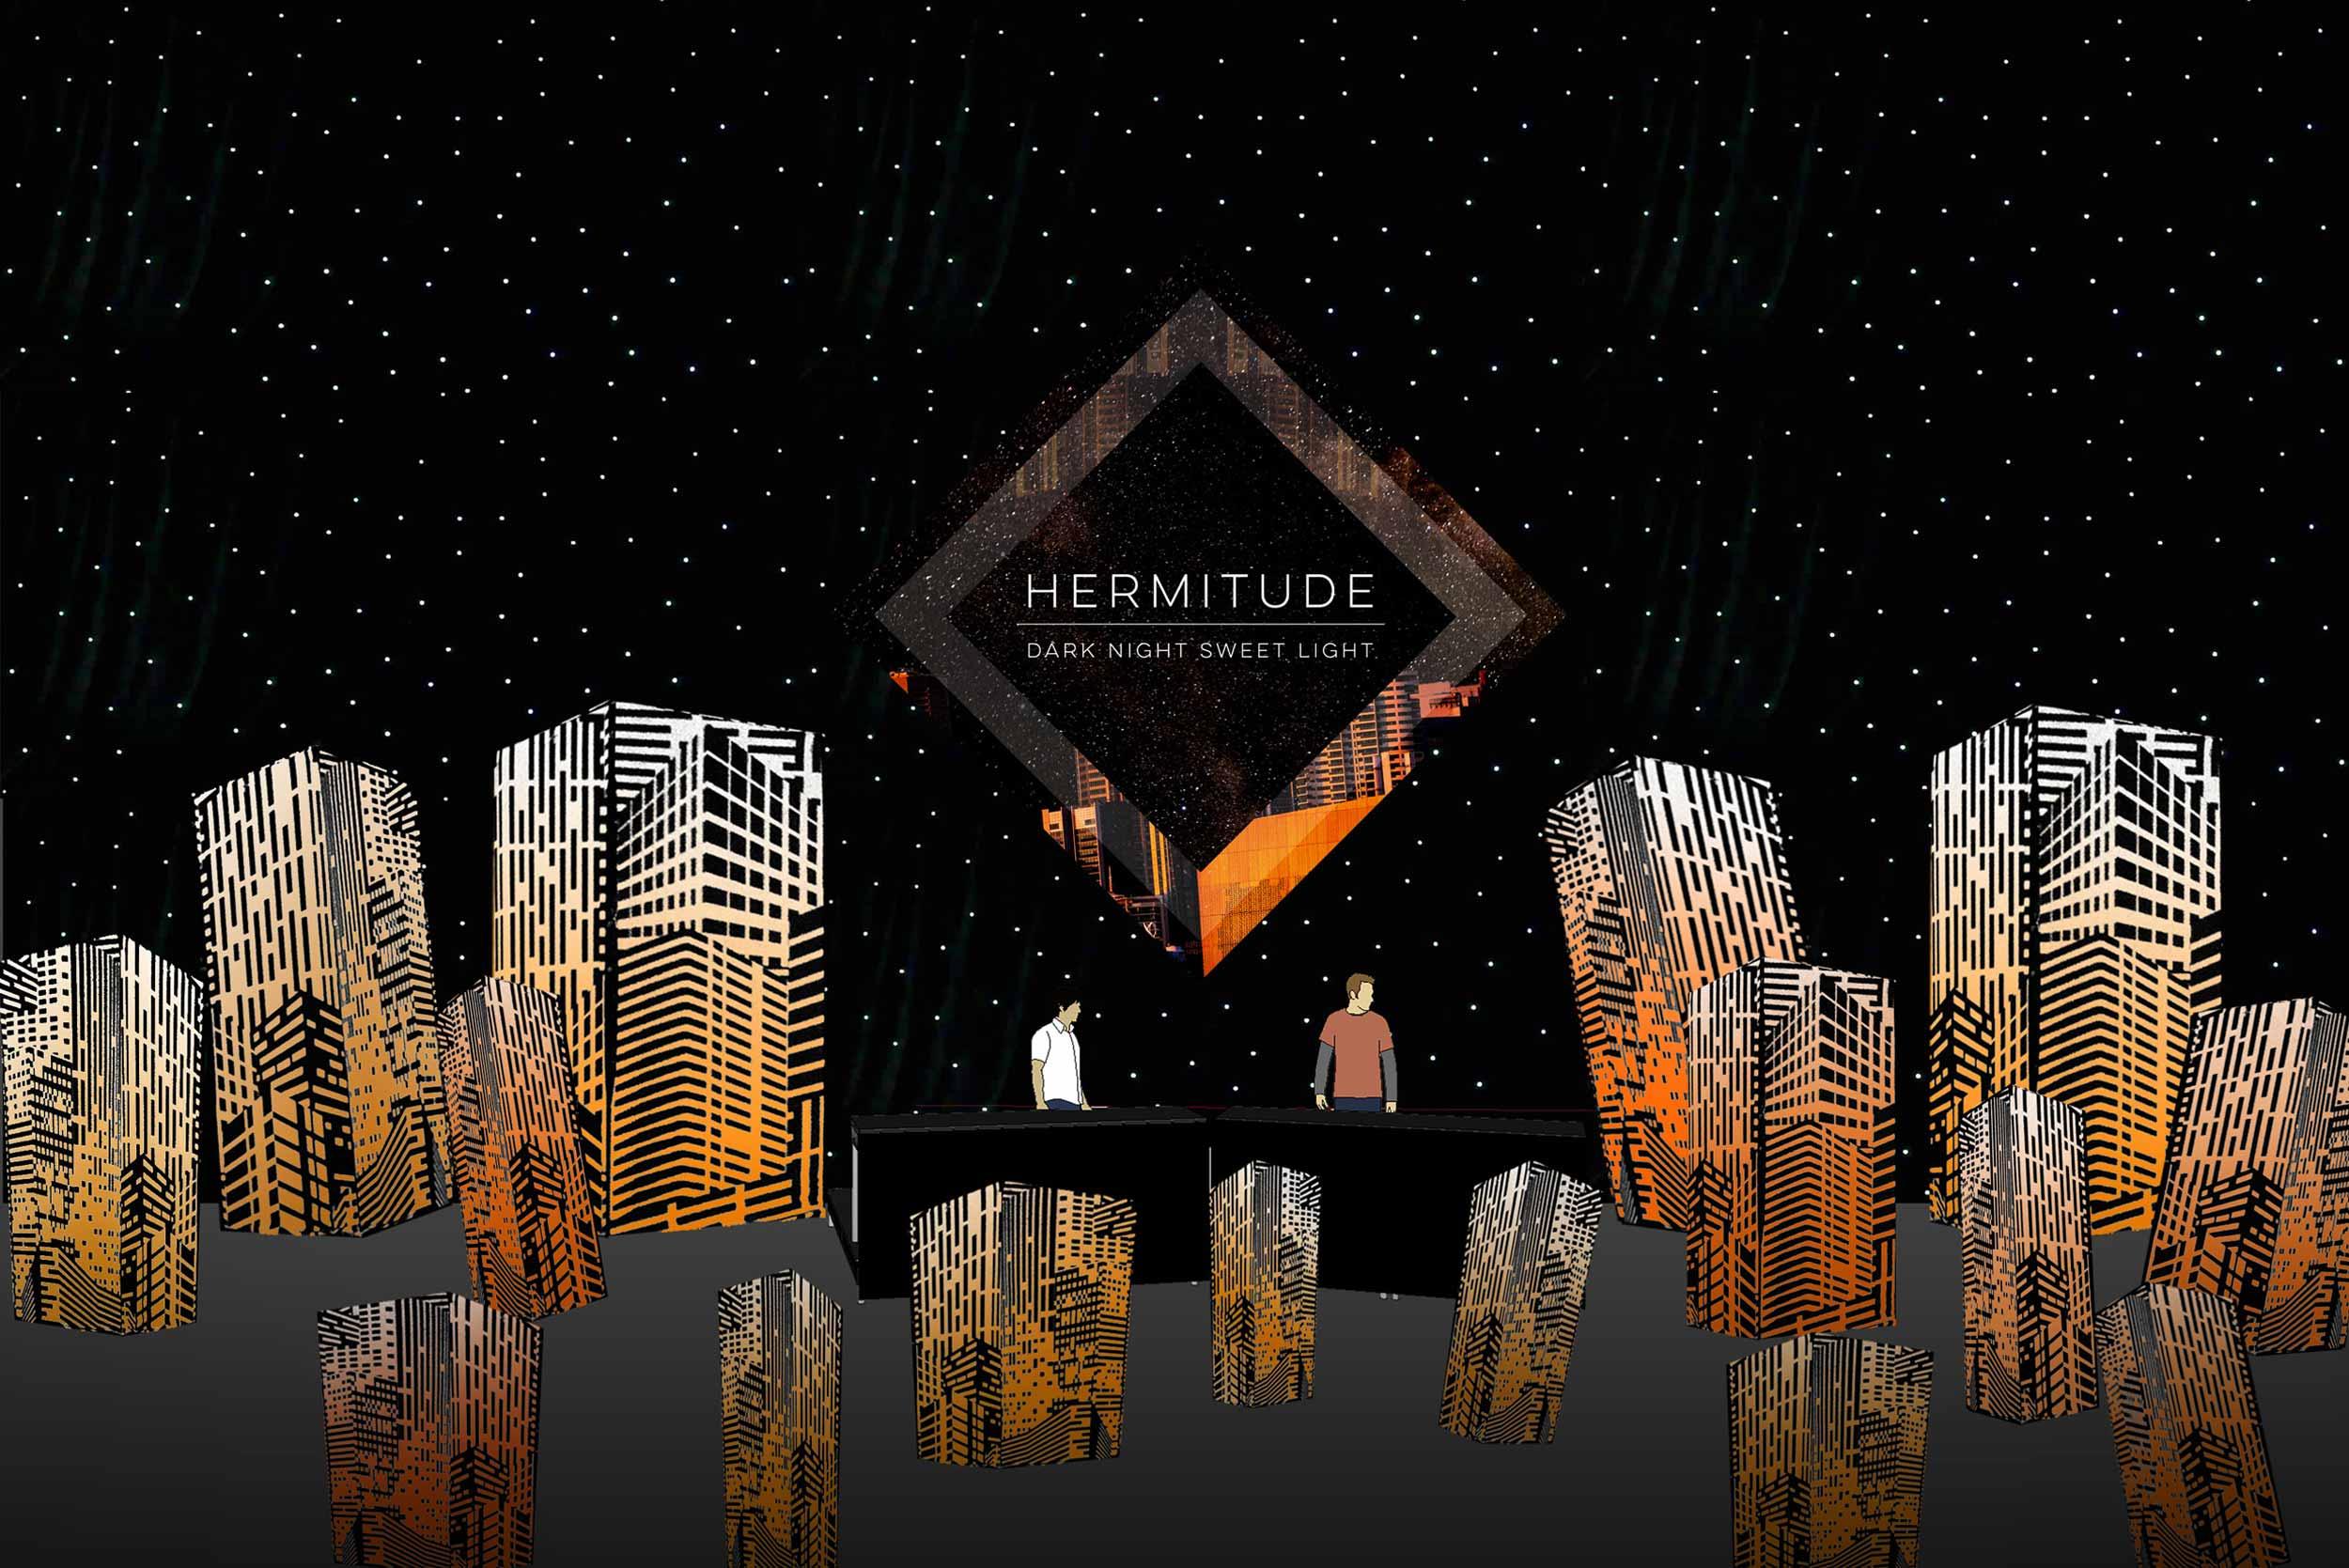 HERMITUDE-11-DARK-NIGHT-SWEET-LIGHT-CRIS-BALDWIN.jpg